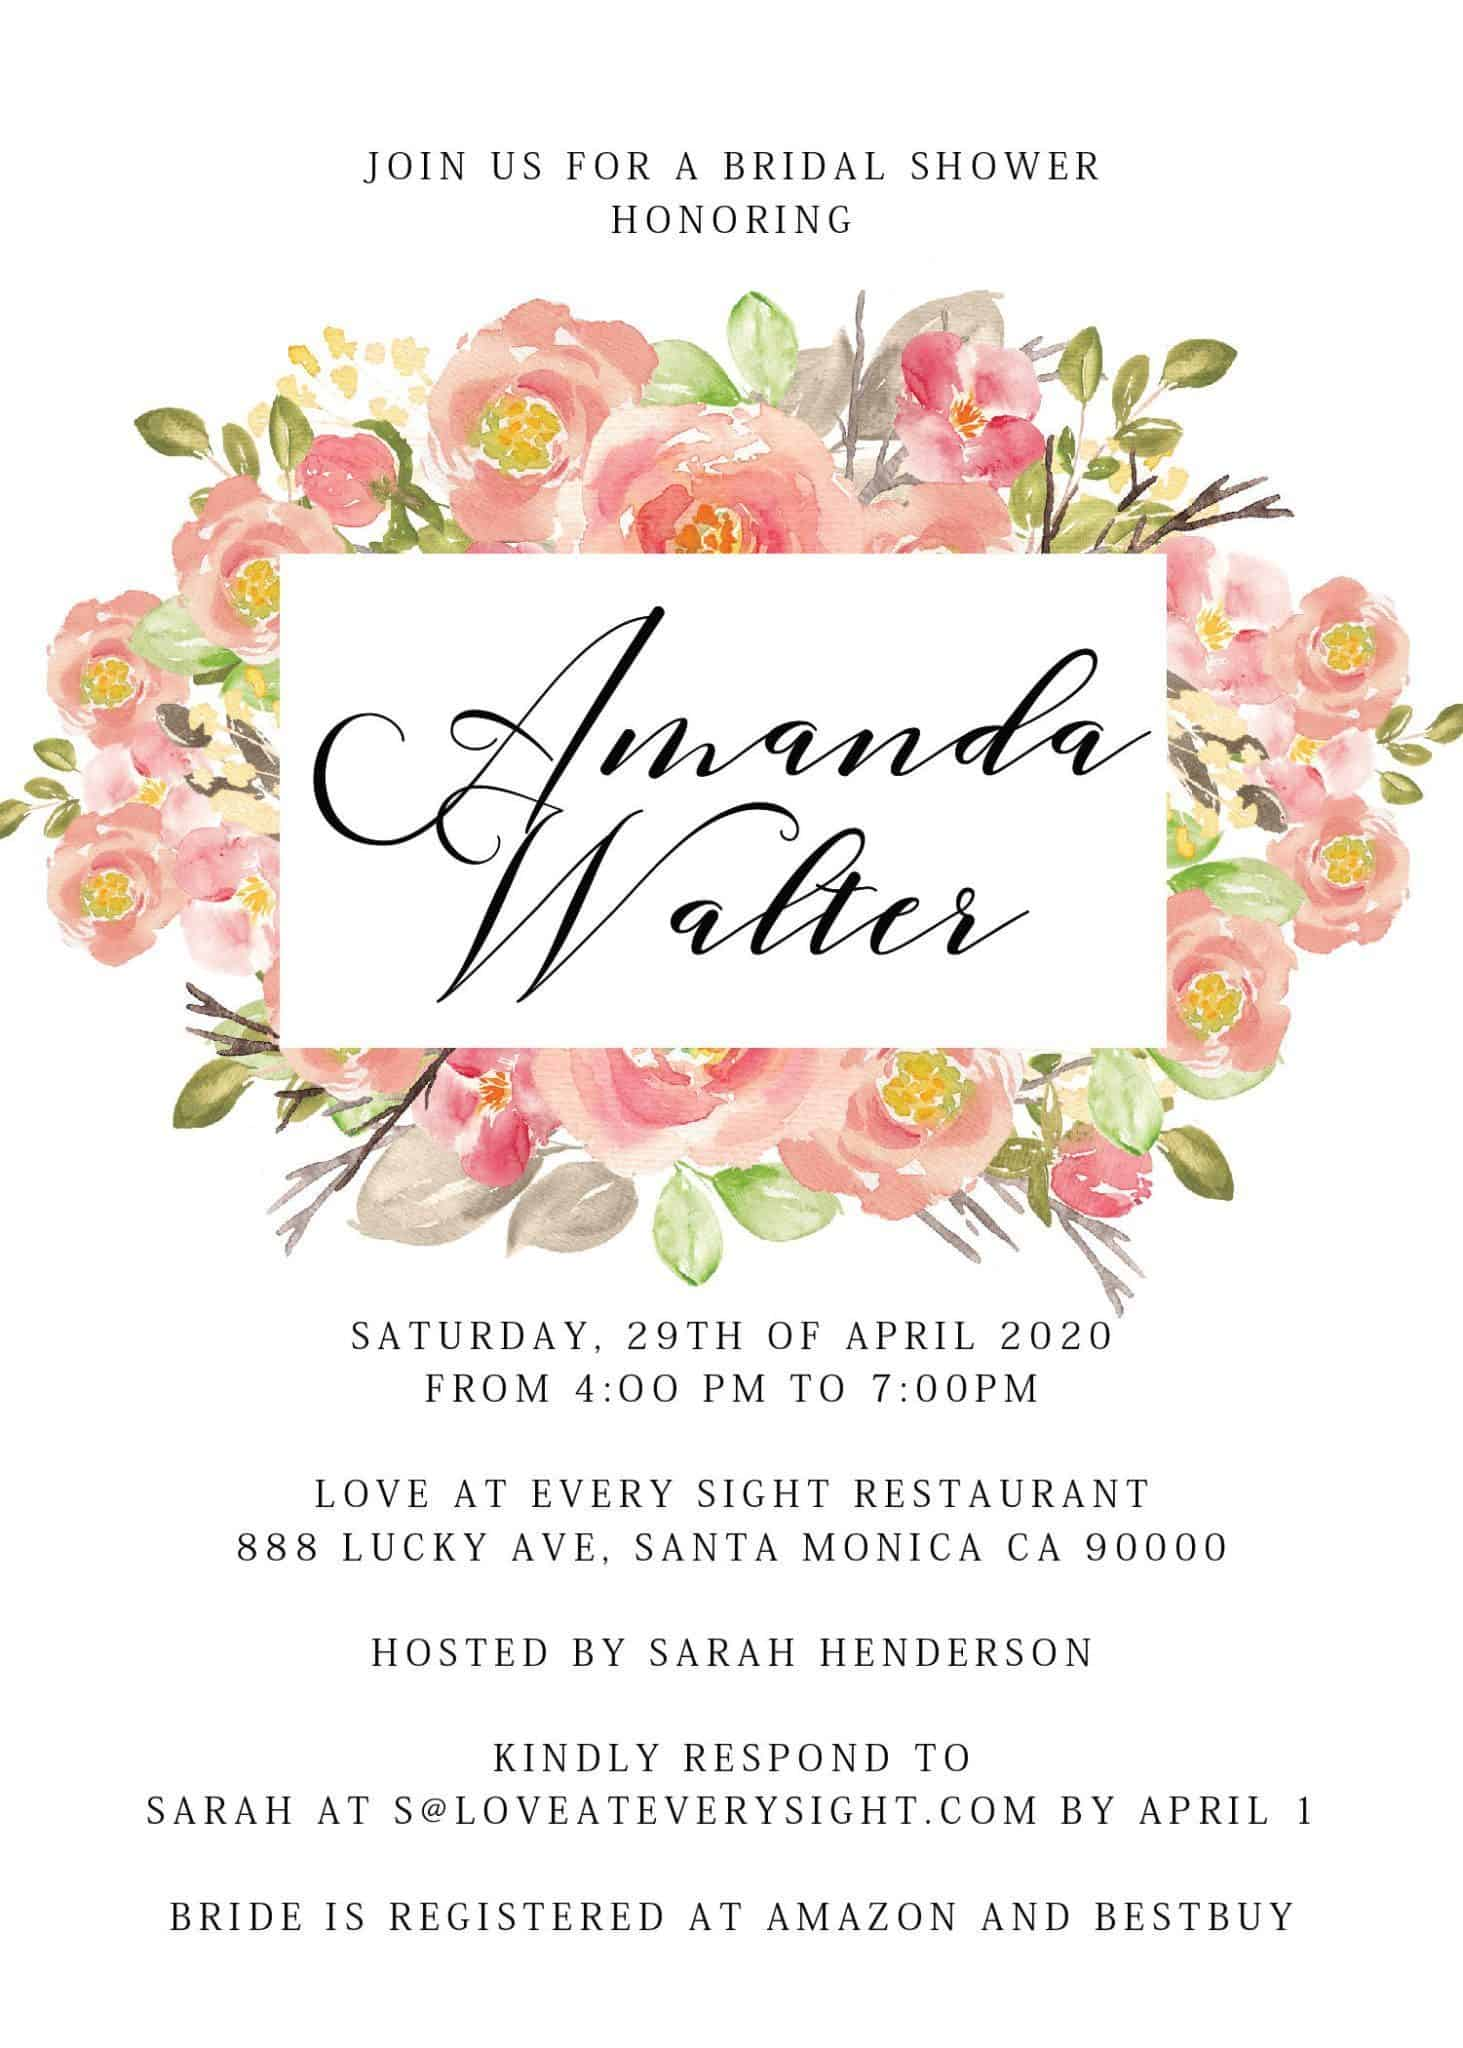 Bridal Shower, Bachelorette Party Cards, Invitation & Invites - Floral Theme Design